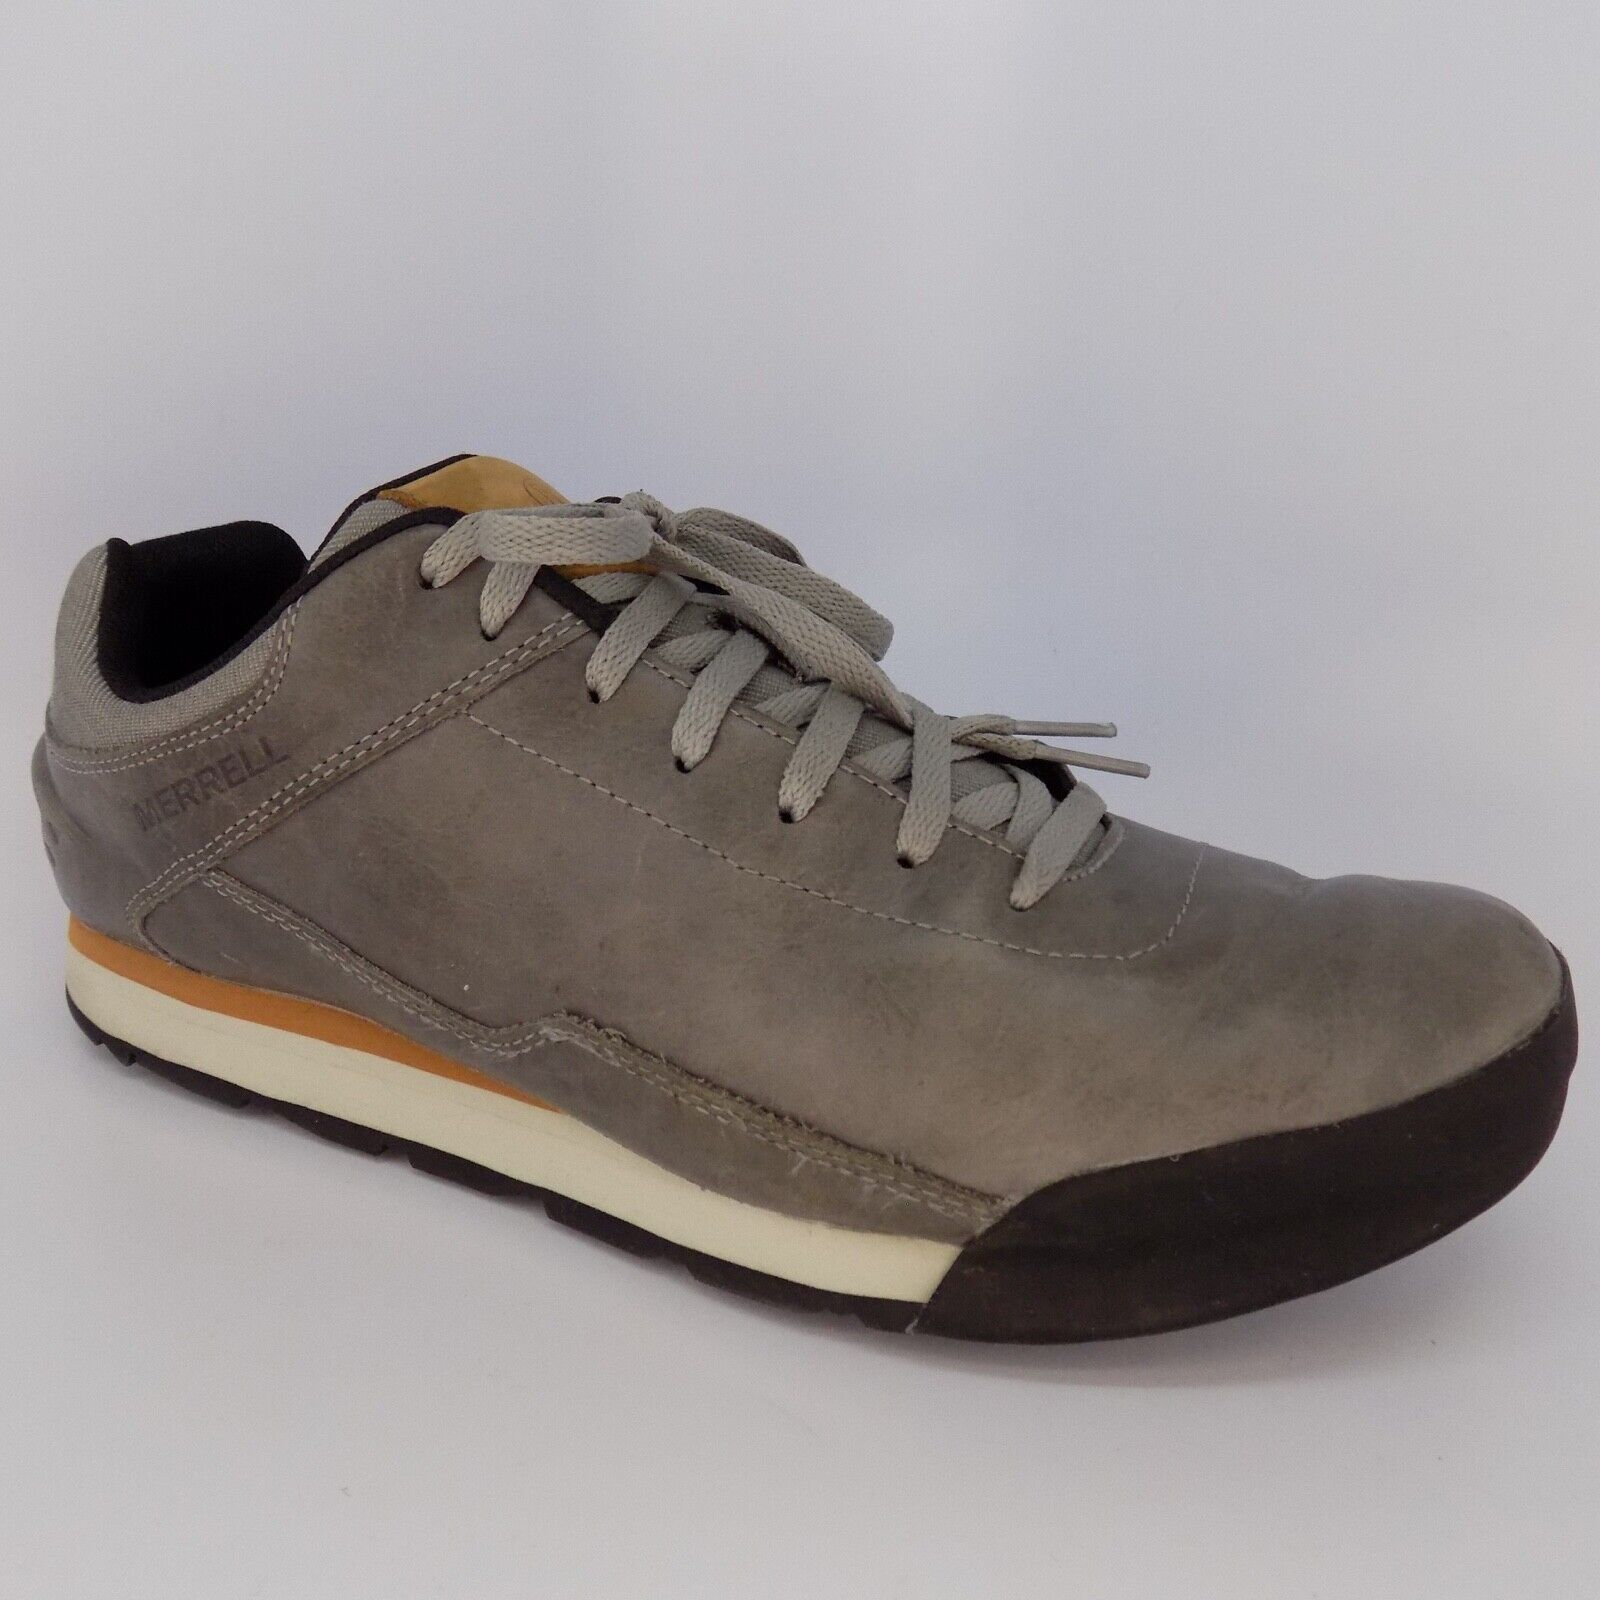 Merrell Burnt secoué LTR Casual Trail Hommes Chaussures Taille 10.5 EU 4.5 AL5563